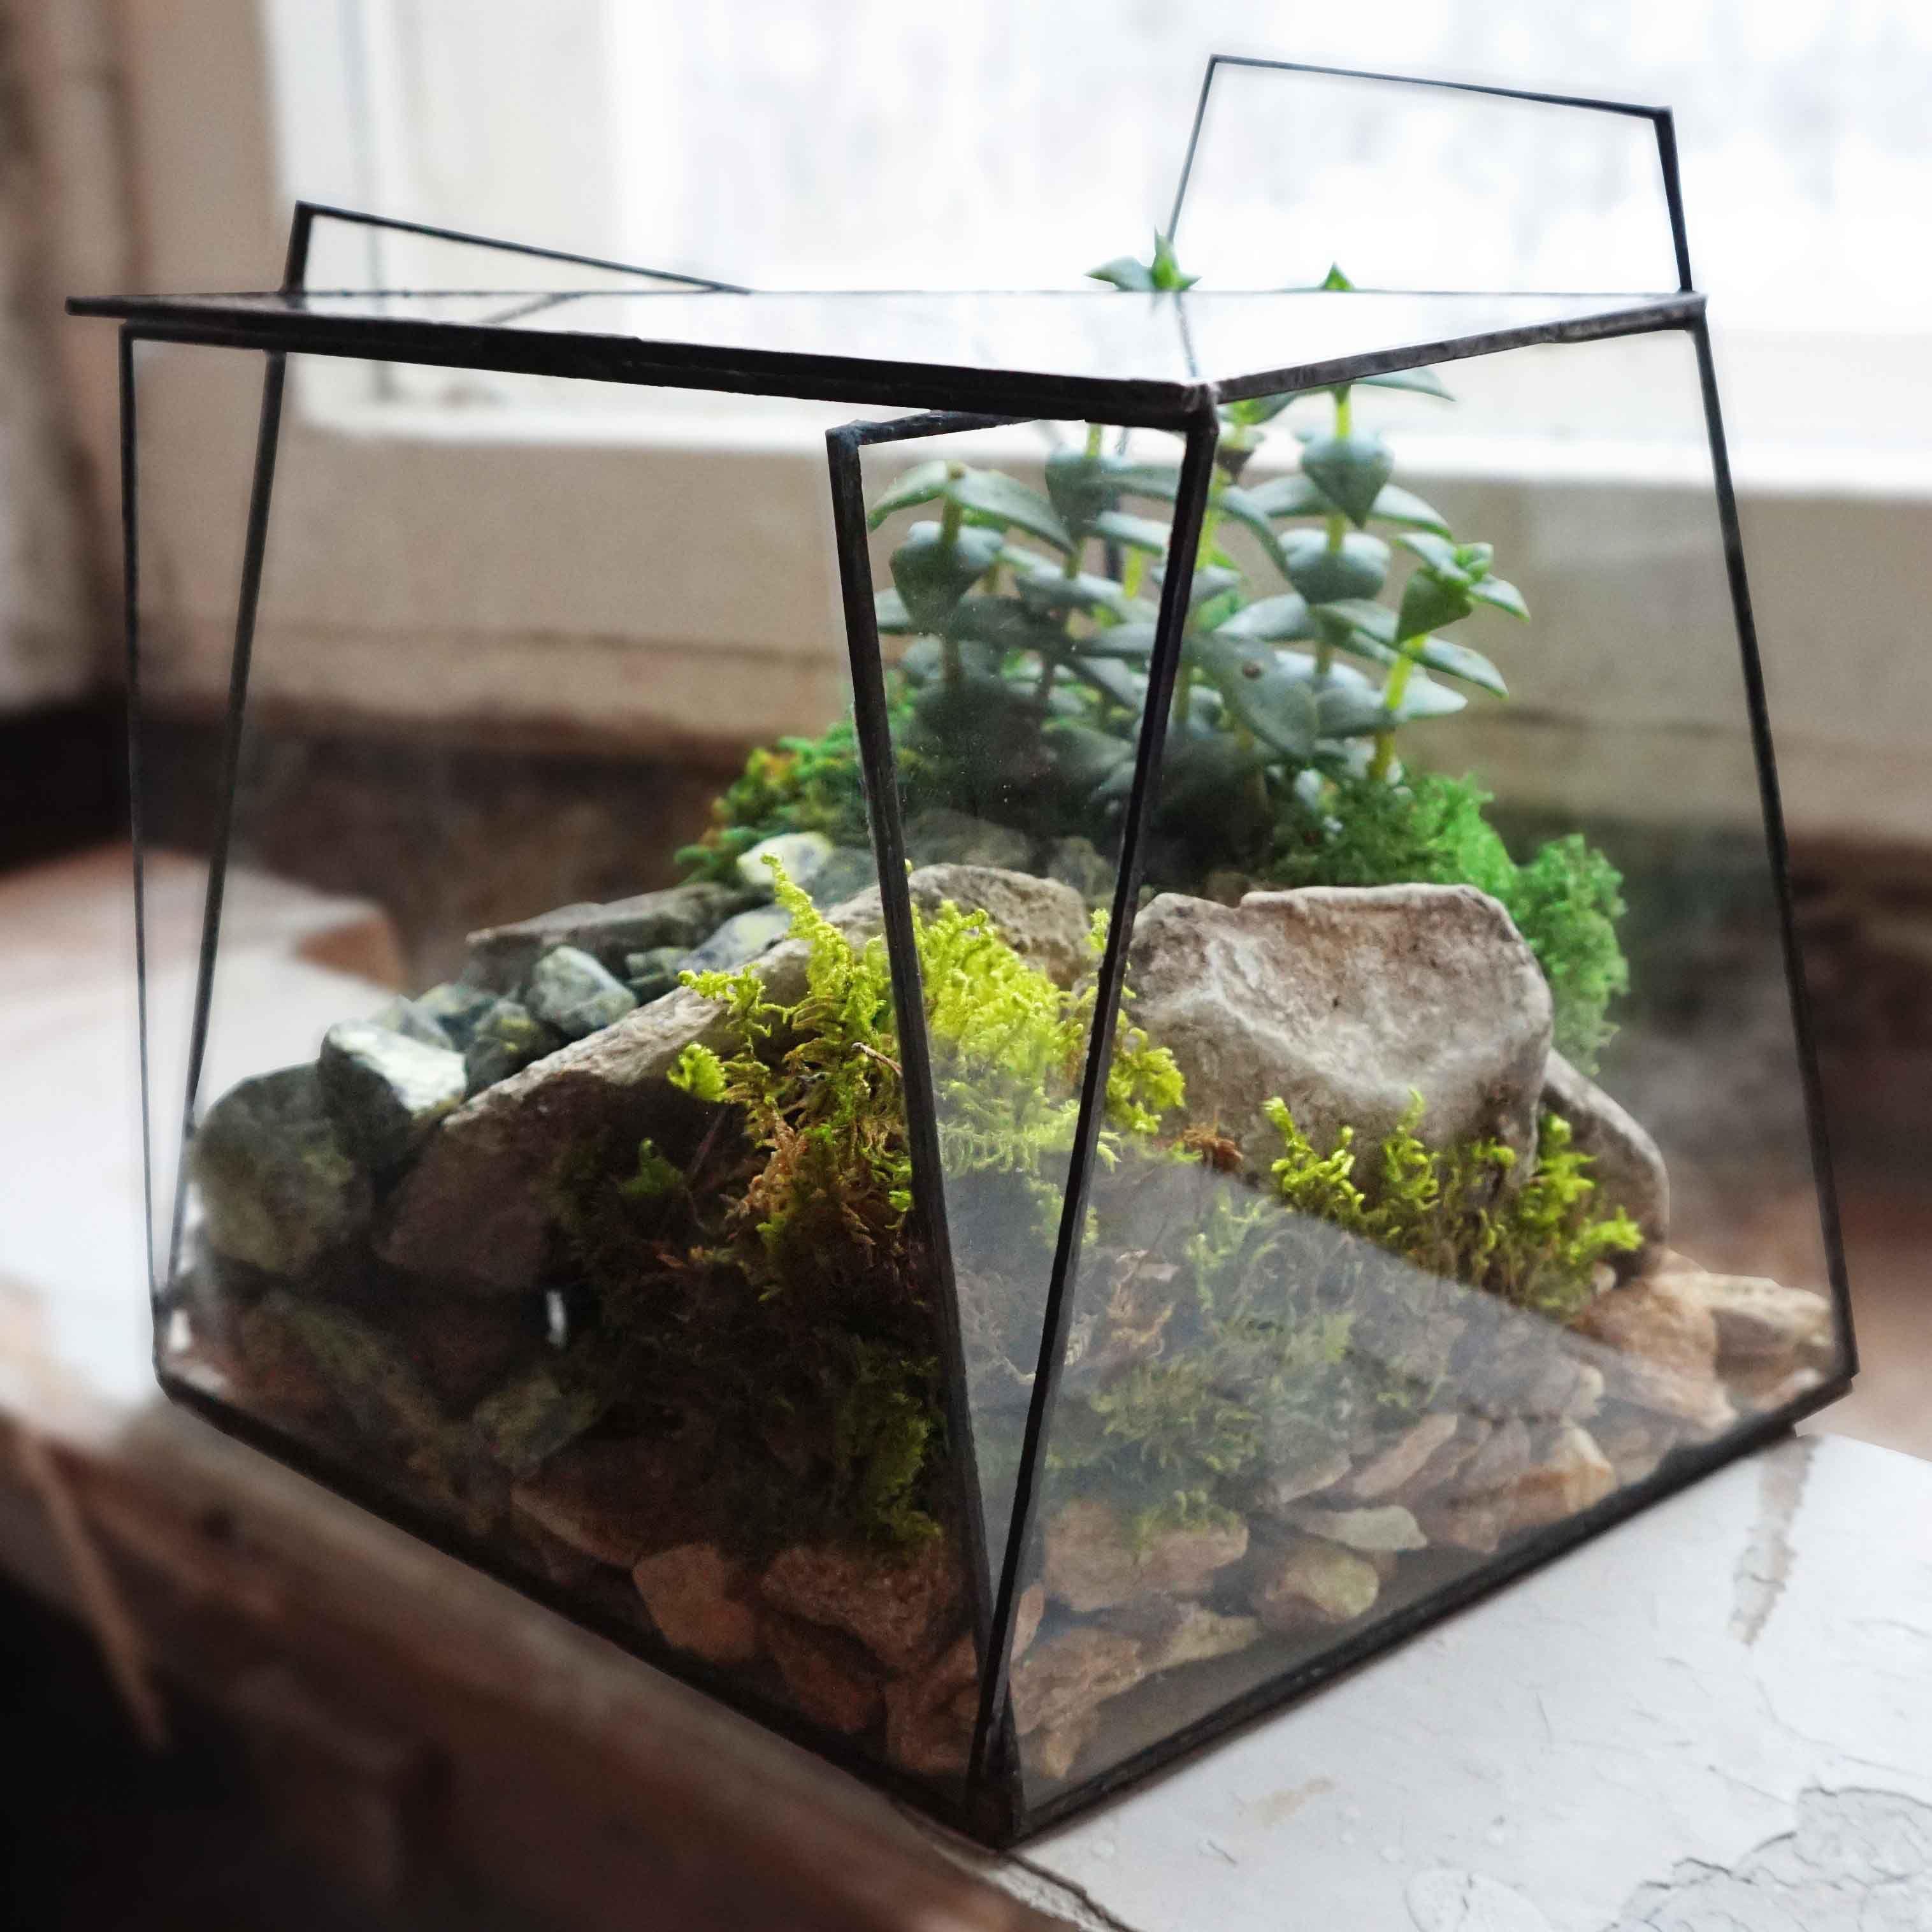 стекло флорариум растения геометрия gift florarium plant glass geometric подарок